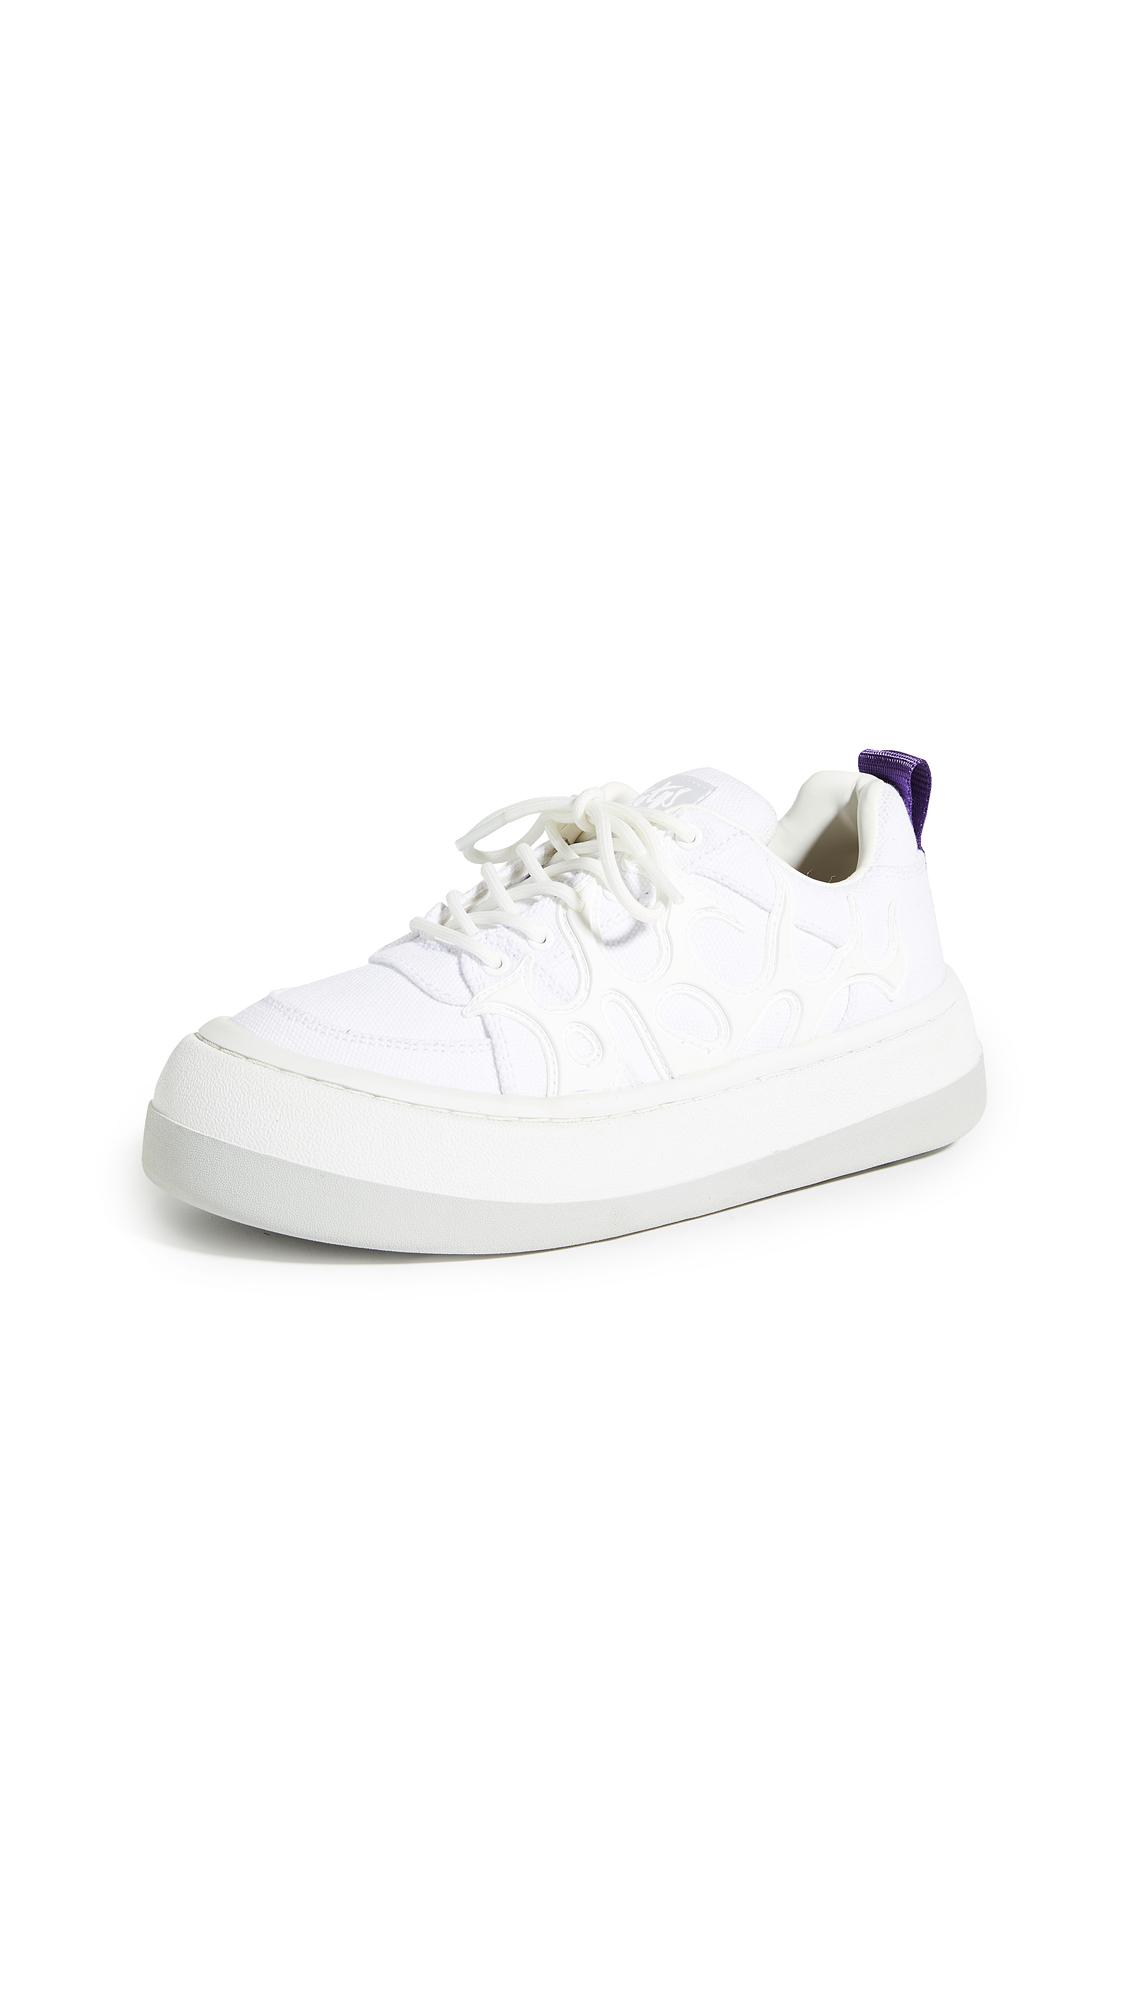 Eytys Sonic Sneakers - 30% Off Sale